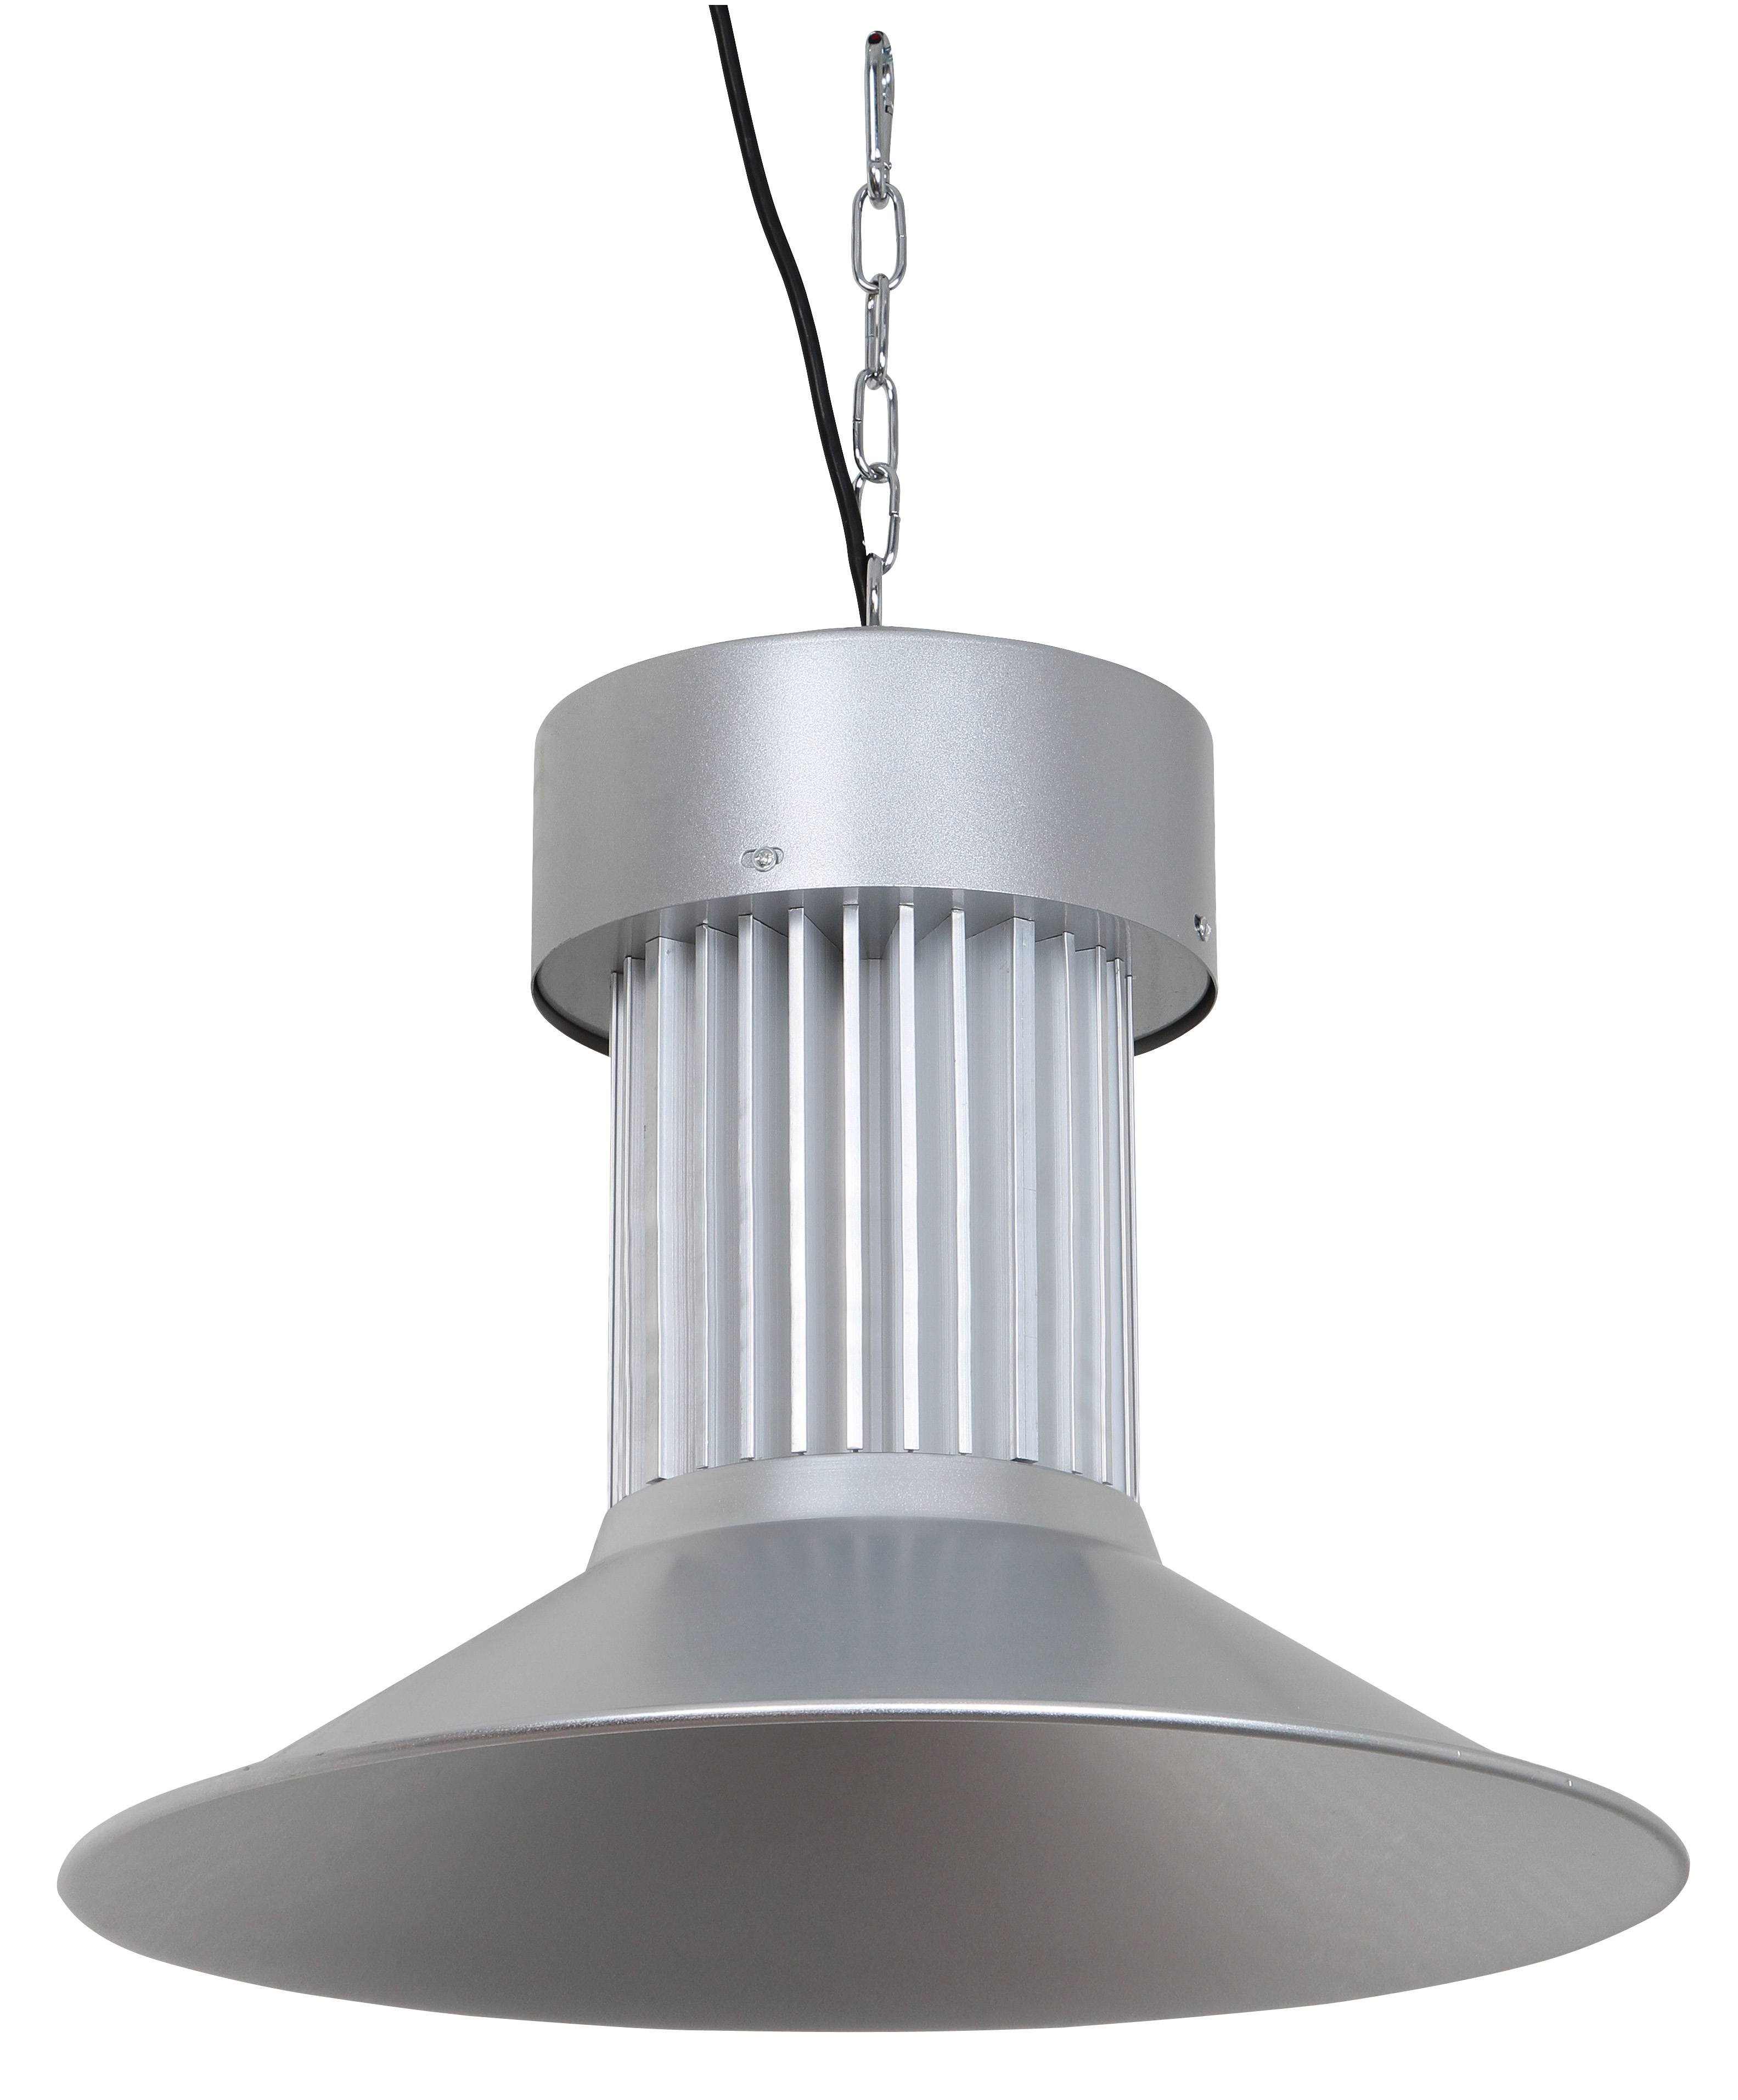 34576_2 Wunderschöne Led Lampen 100 Watt Dekorationen